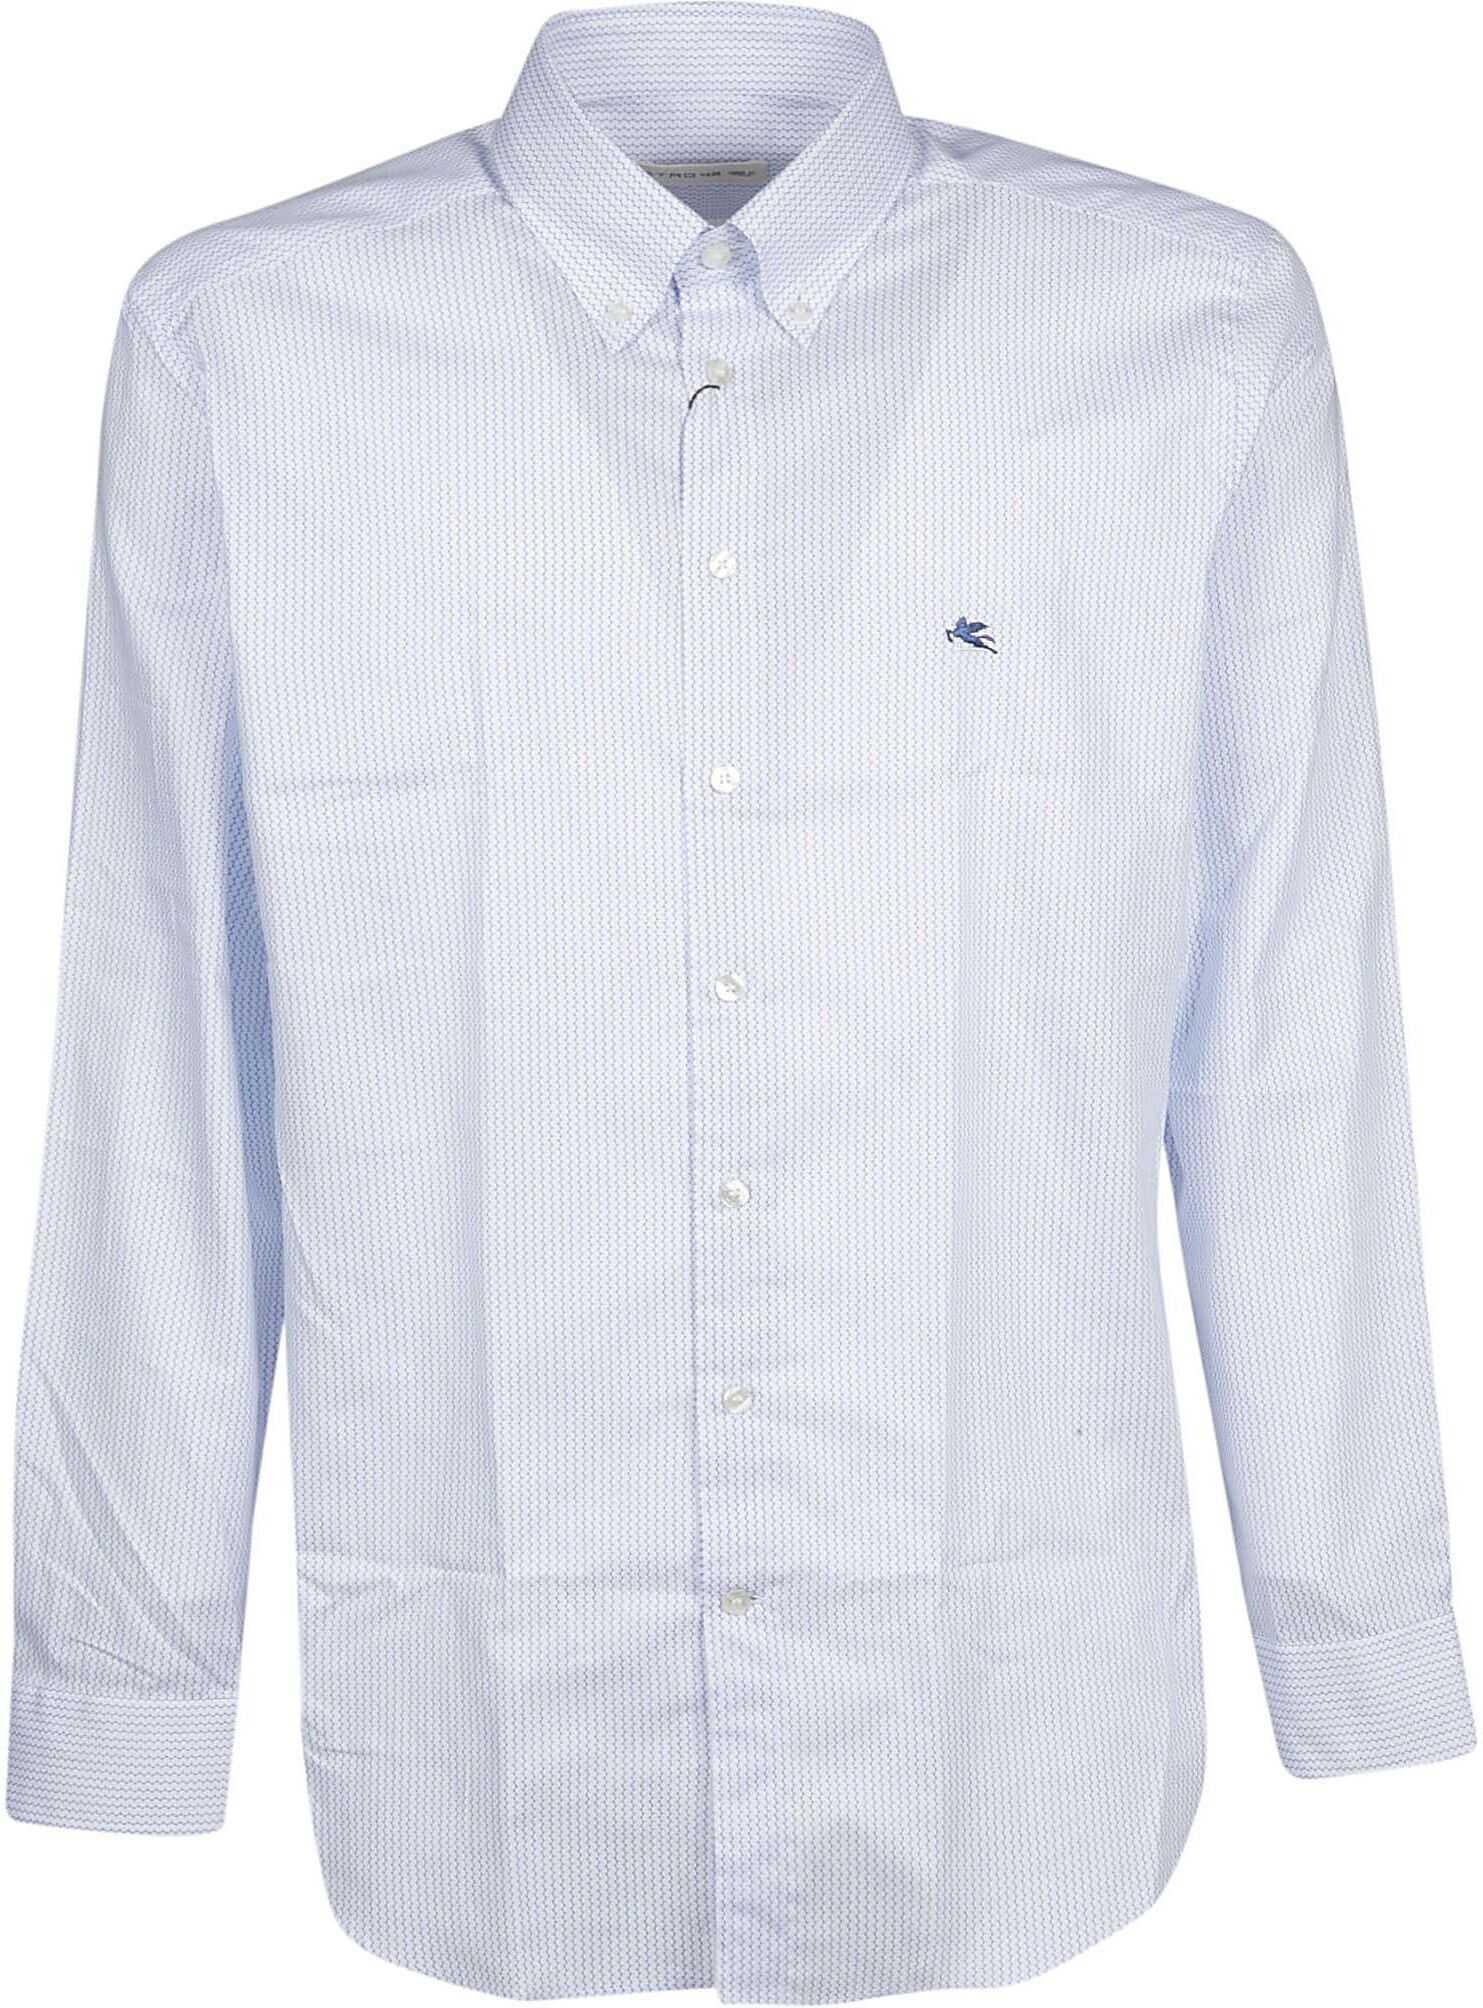 ETRO 1K9646151250 Cotton Shirt thumbnail